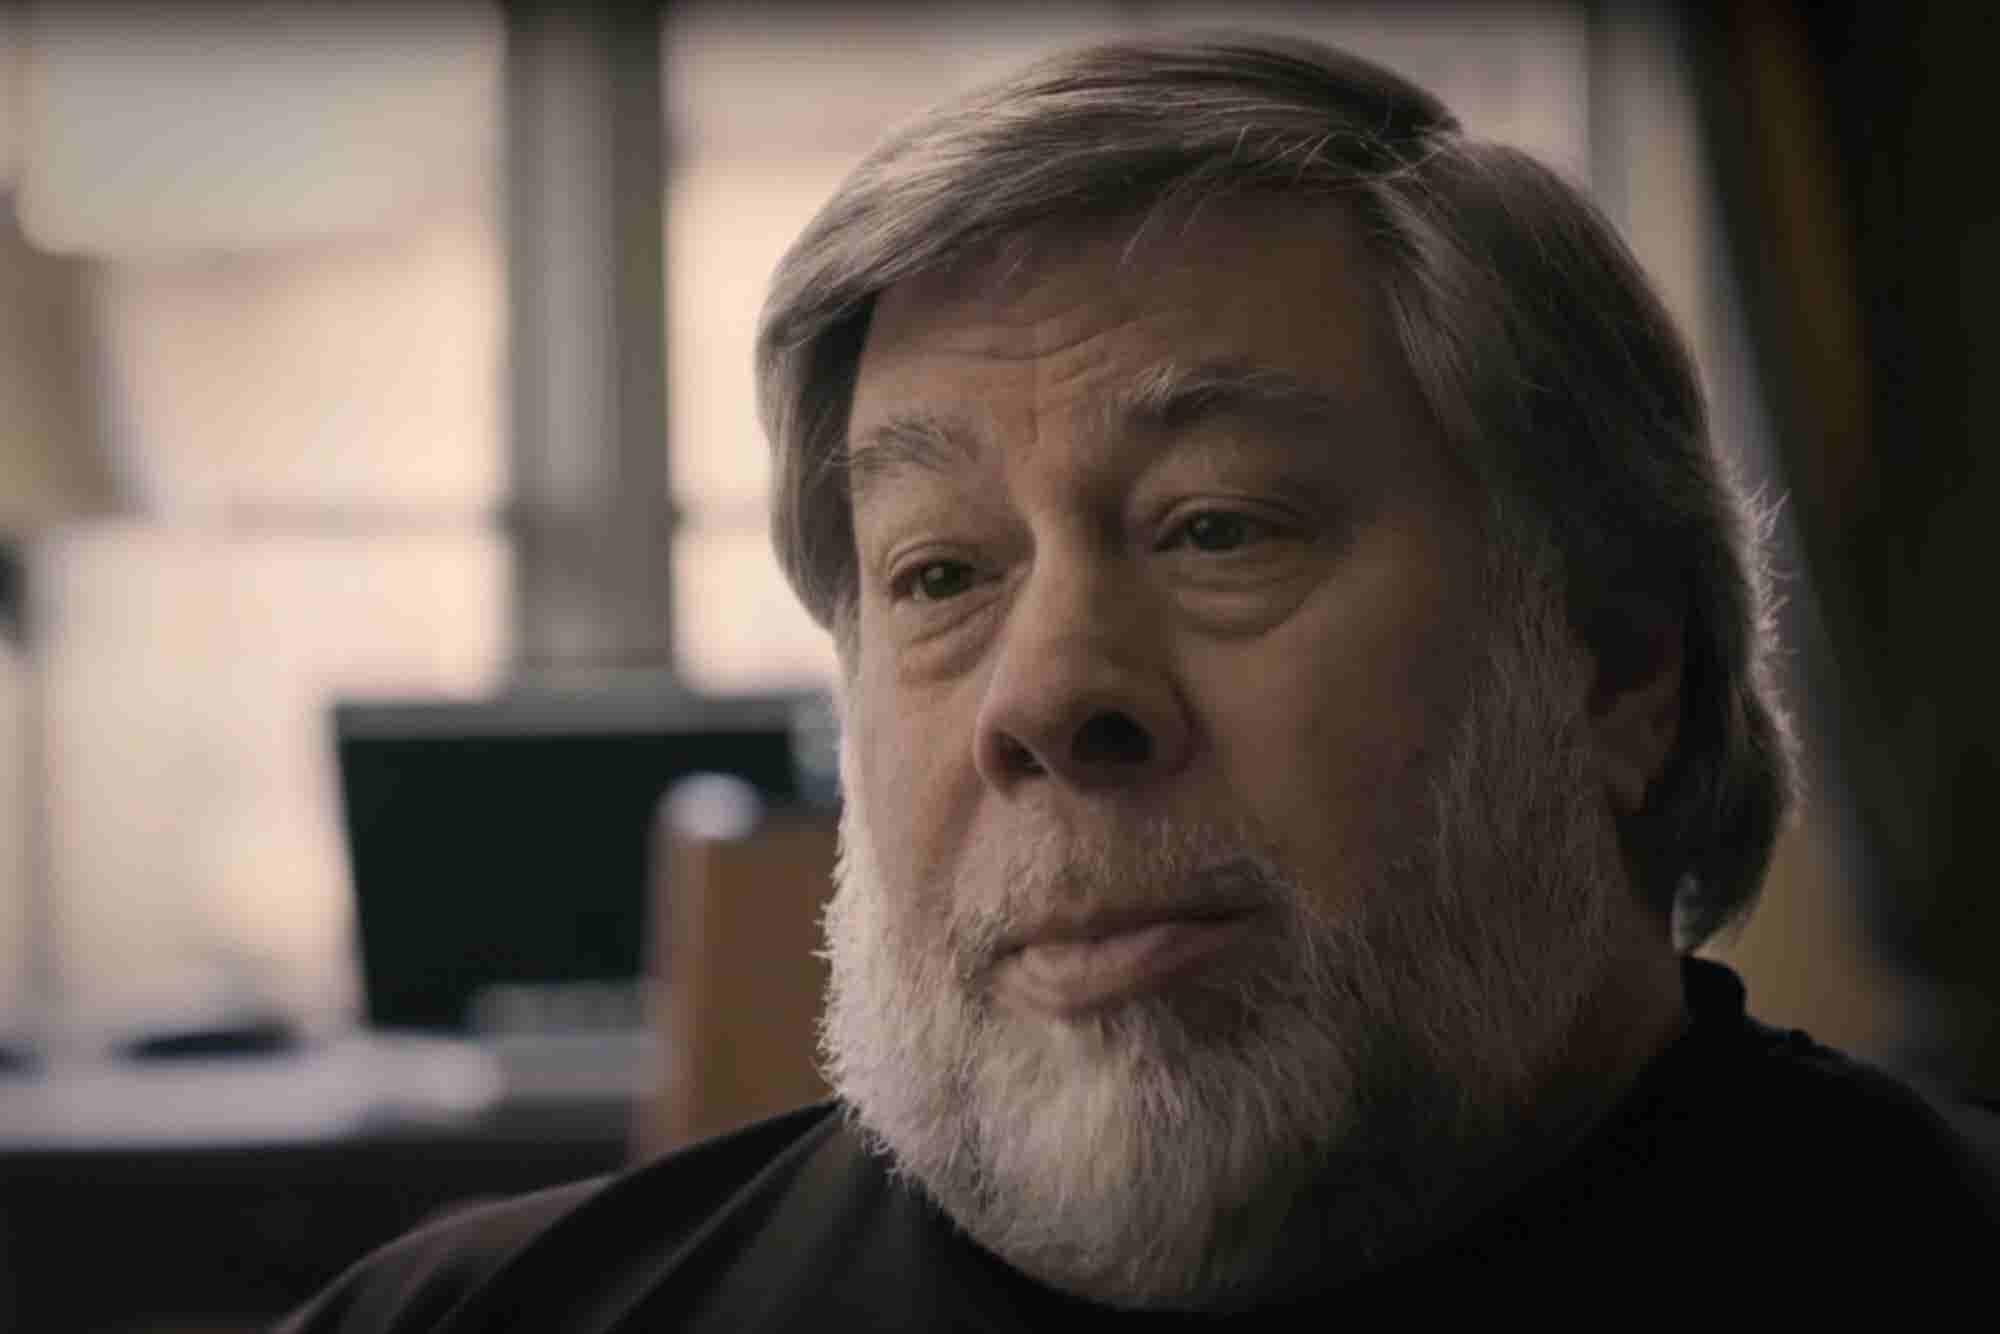 Apple Co-Founder Steve Wozniak Sweetly Describes How He Fell in Love With Tech in Fun Reddit Video